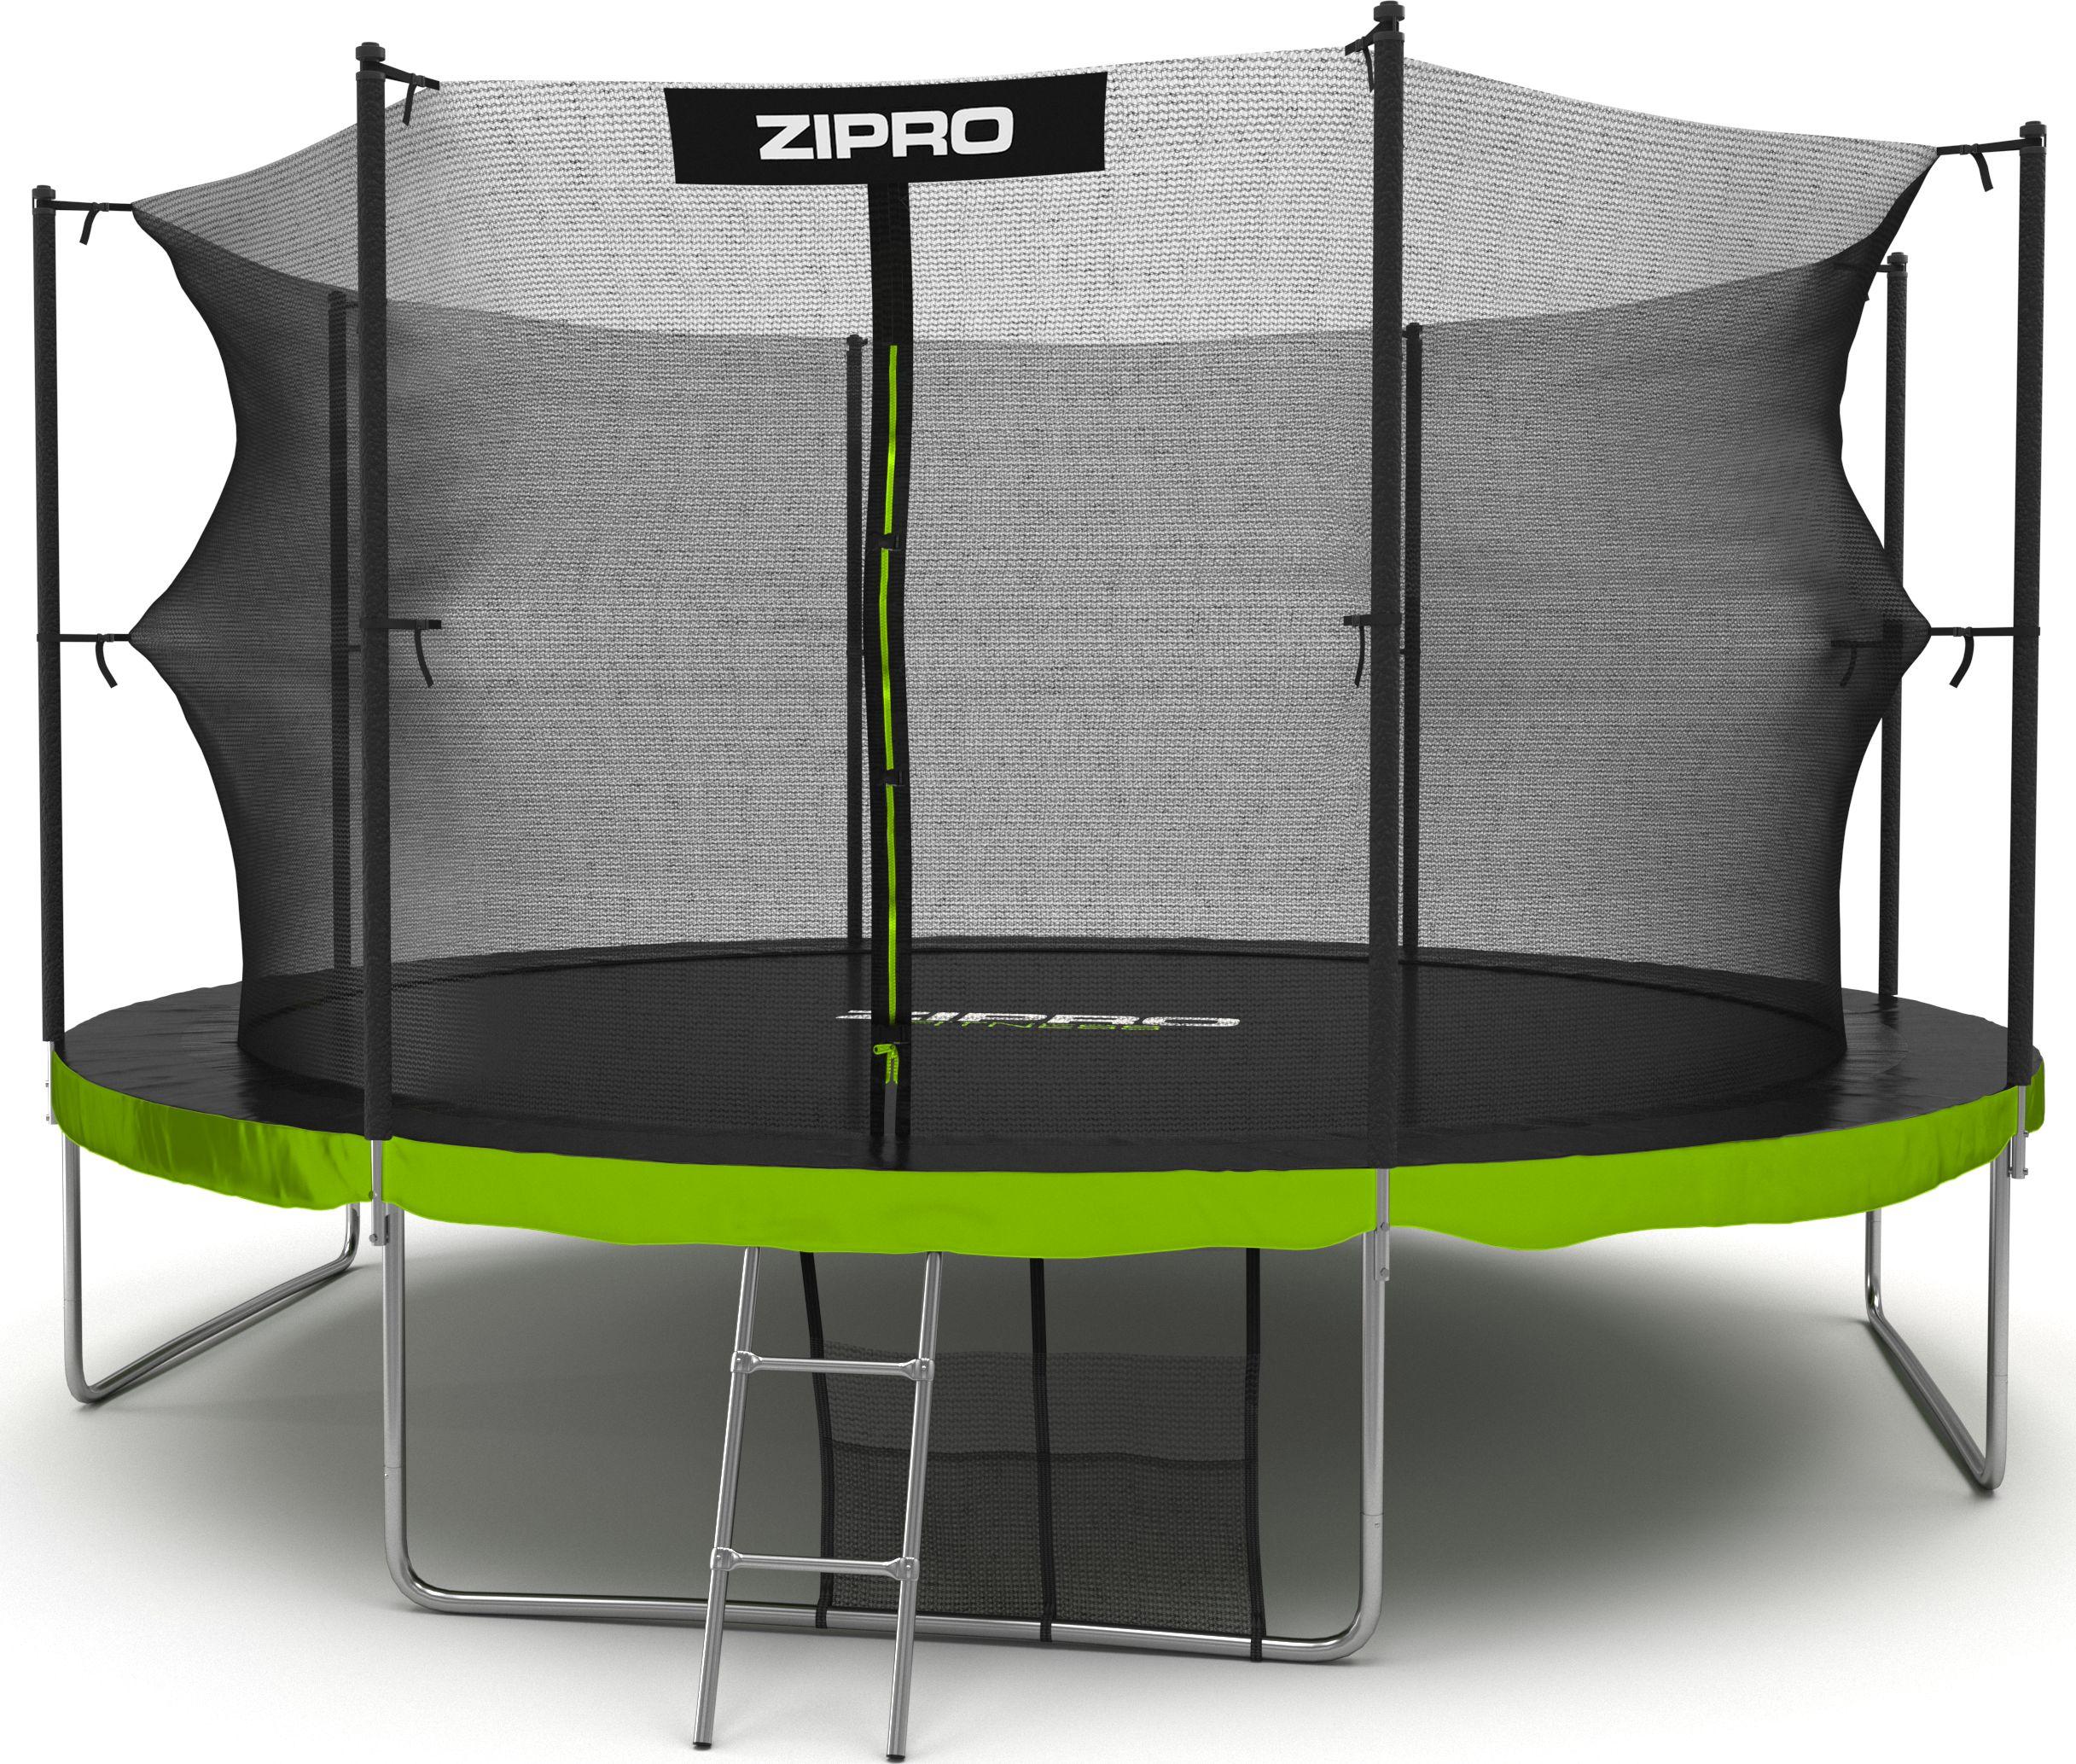 Zipro Garden trampoline with internal mesh 14FT 435cm + FREE shoe bag! Batuts